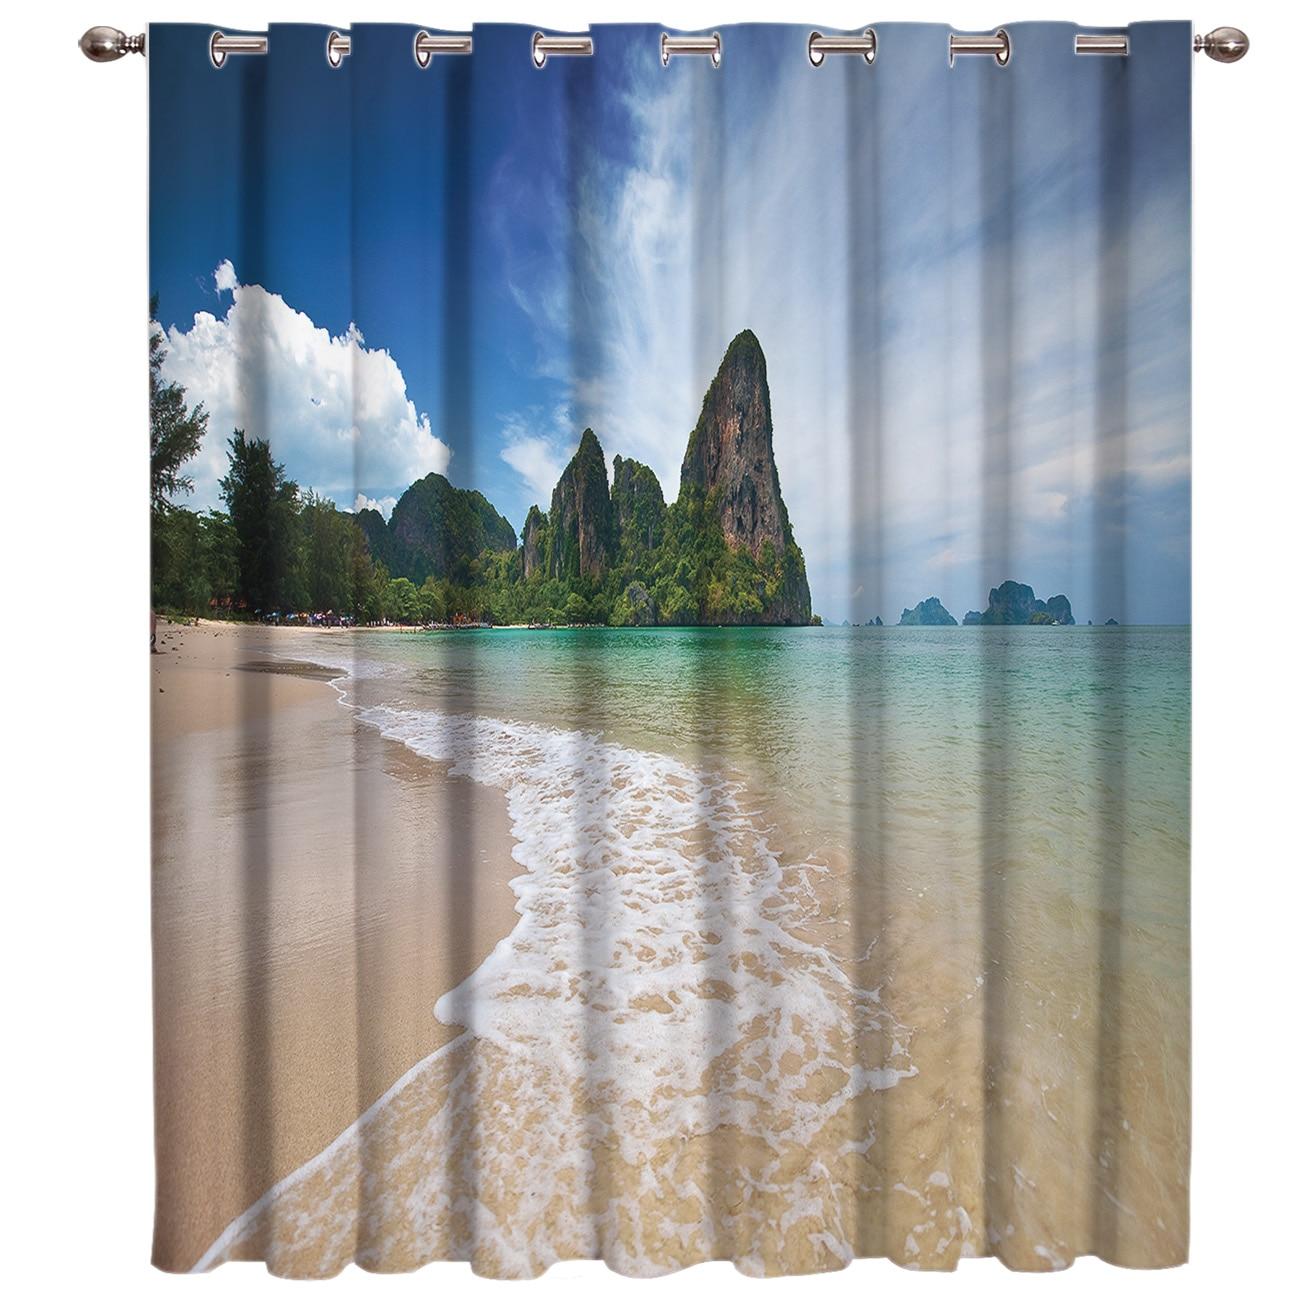 Nature Beach Sea Window Treatments Curtains Valance Window Curtains Dark Curtain Lights Blackout Outdoor Indoor Fabric Decor Kid